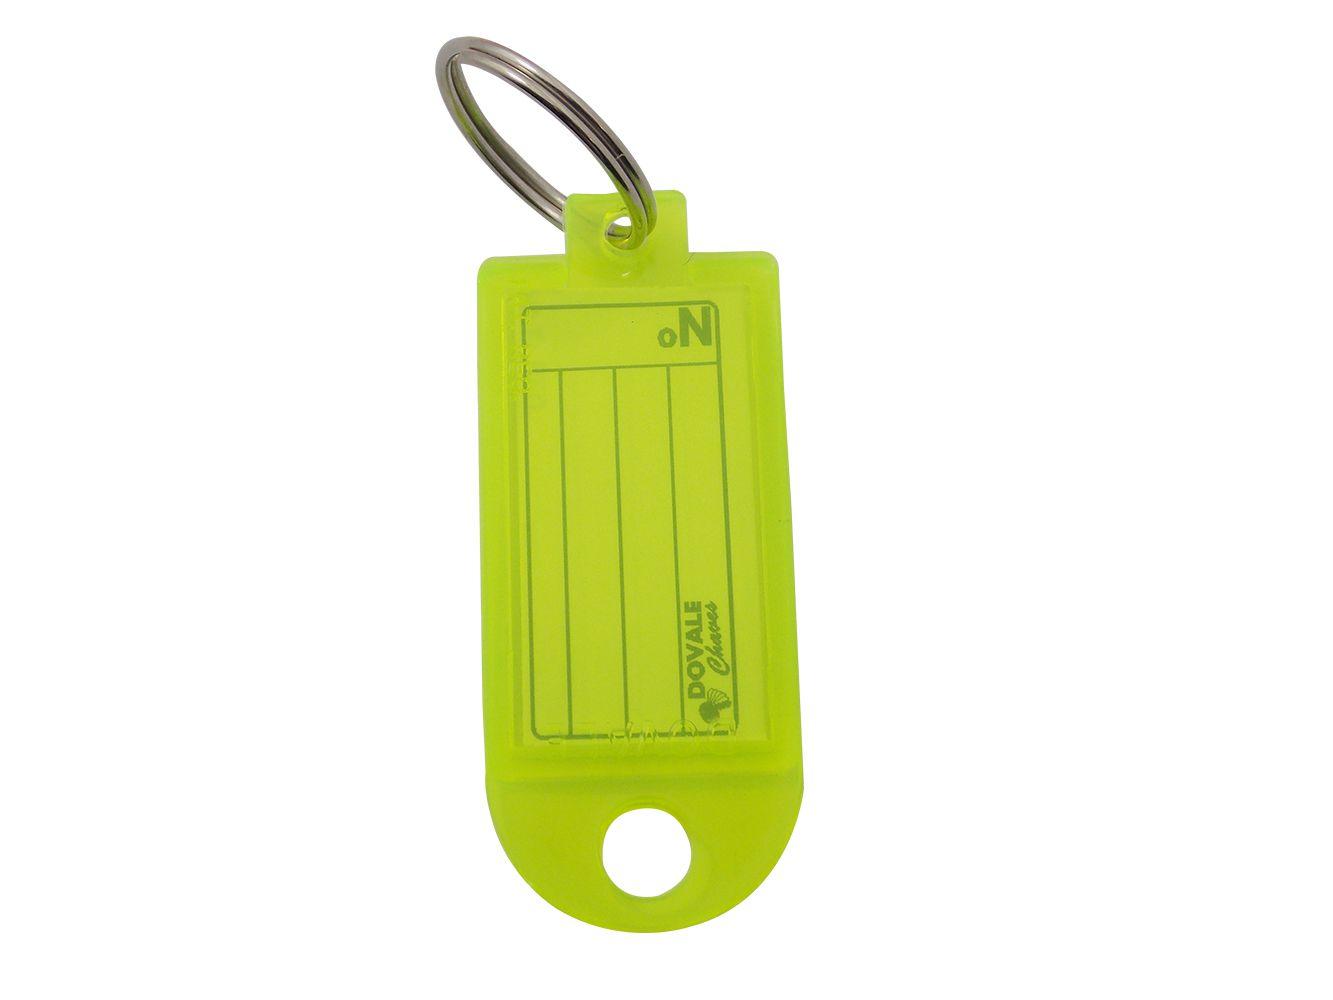 Etiqueta Dovale Amarelo Fluorescente - Refil C/ 50 - 79229